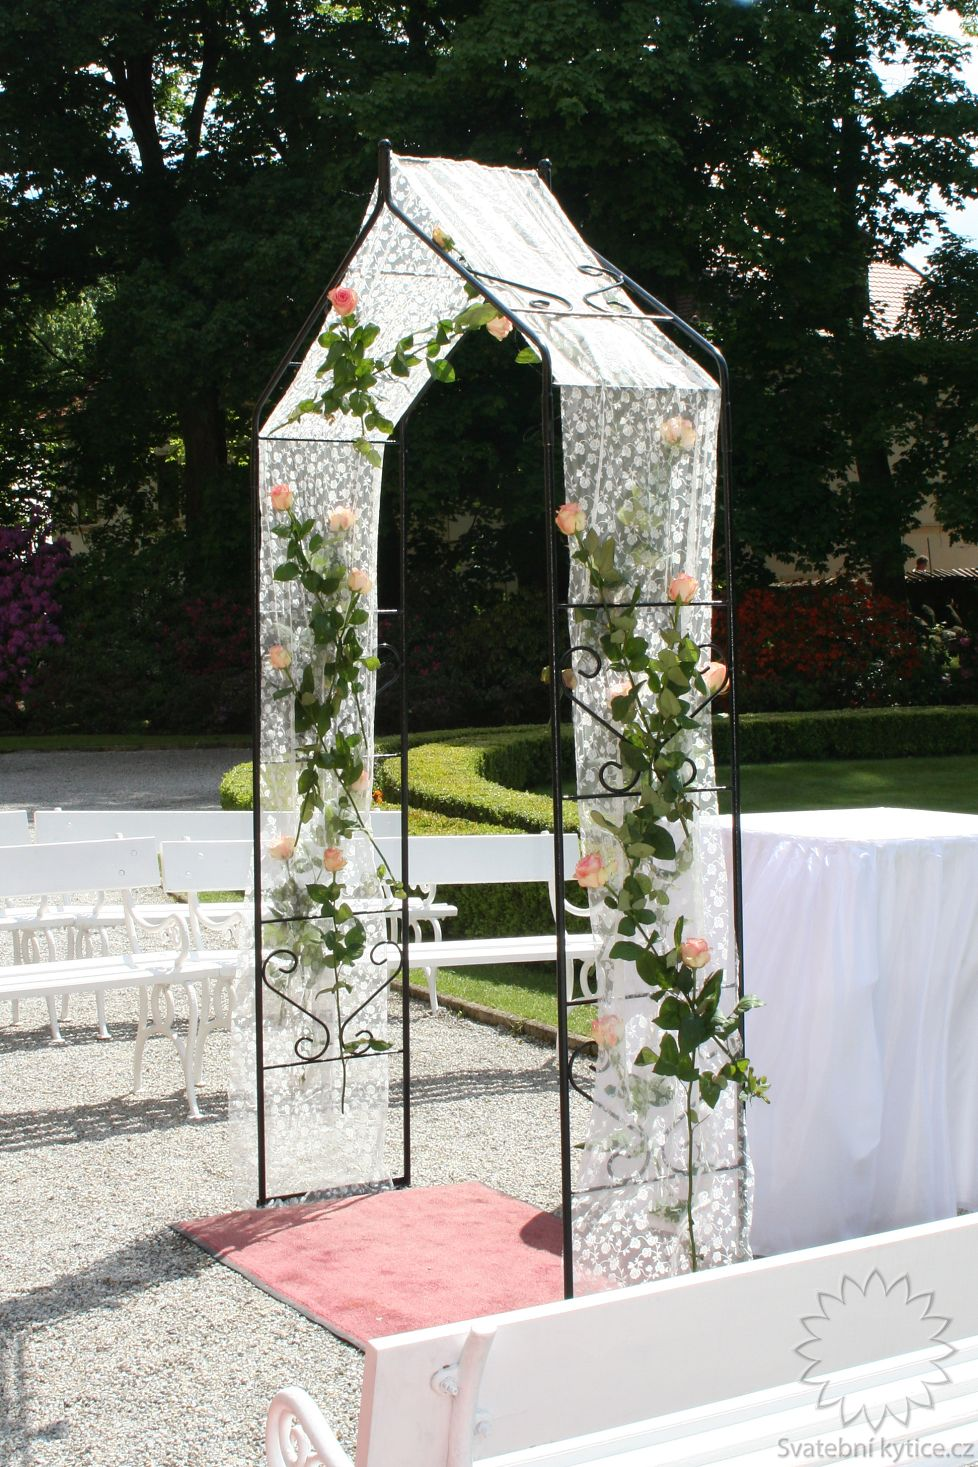 Kvetinovy Svatebni Oblouk 340 Svatebni Kytice Cz